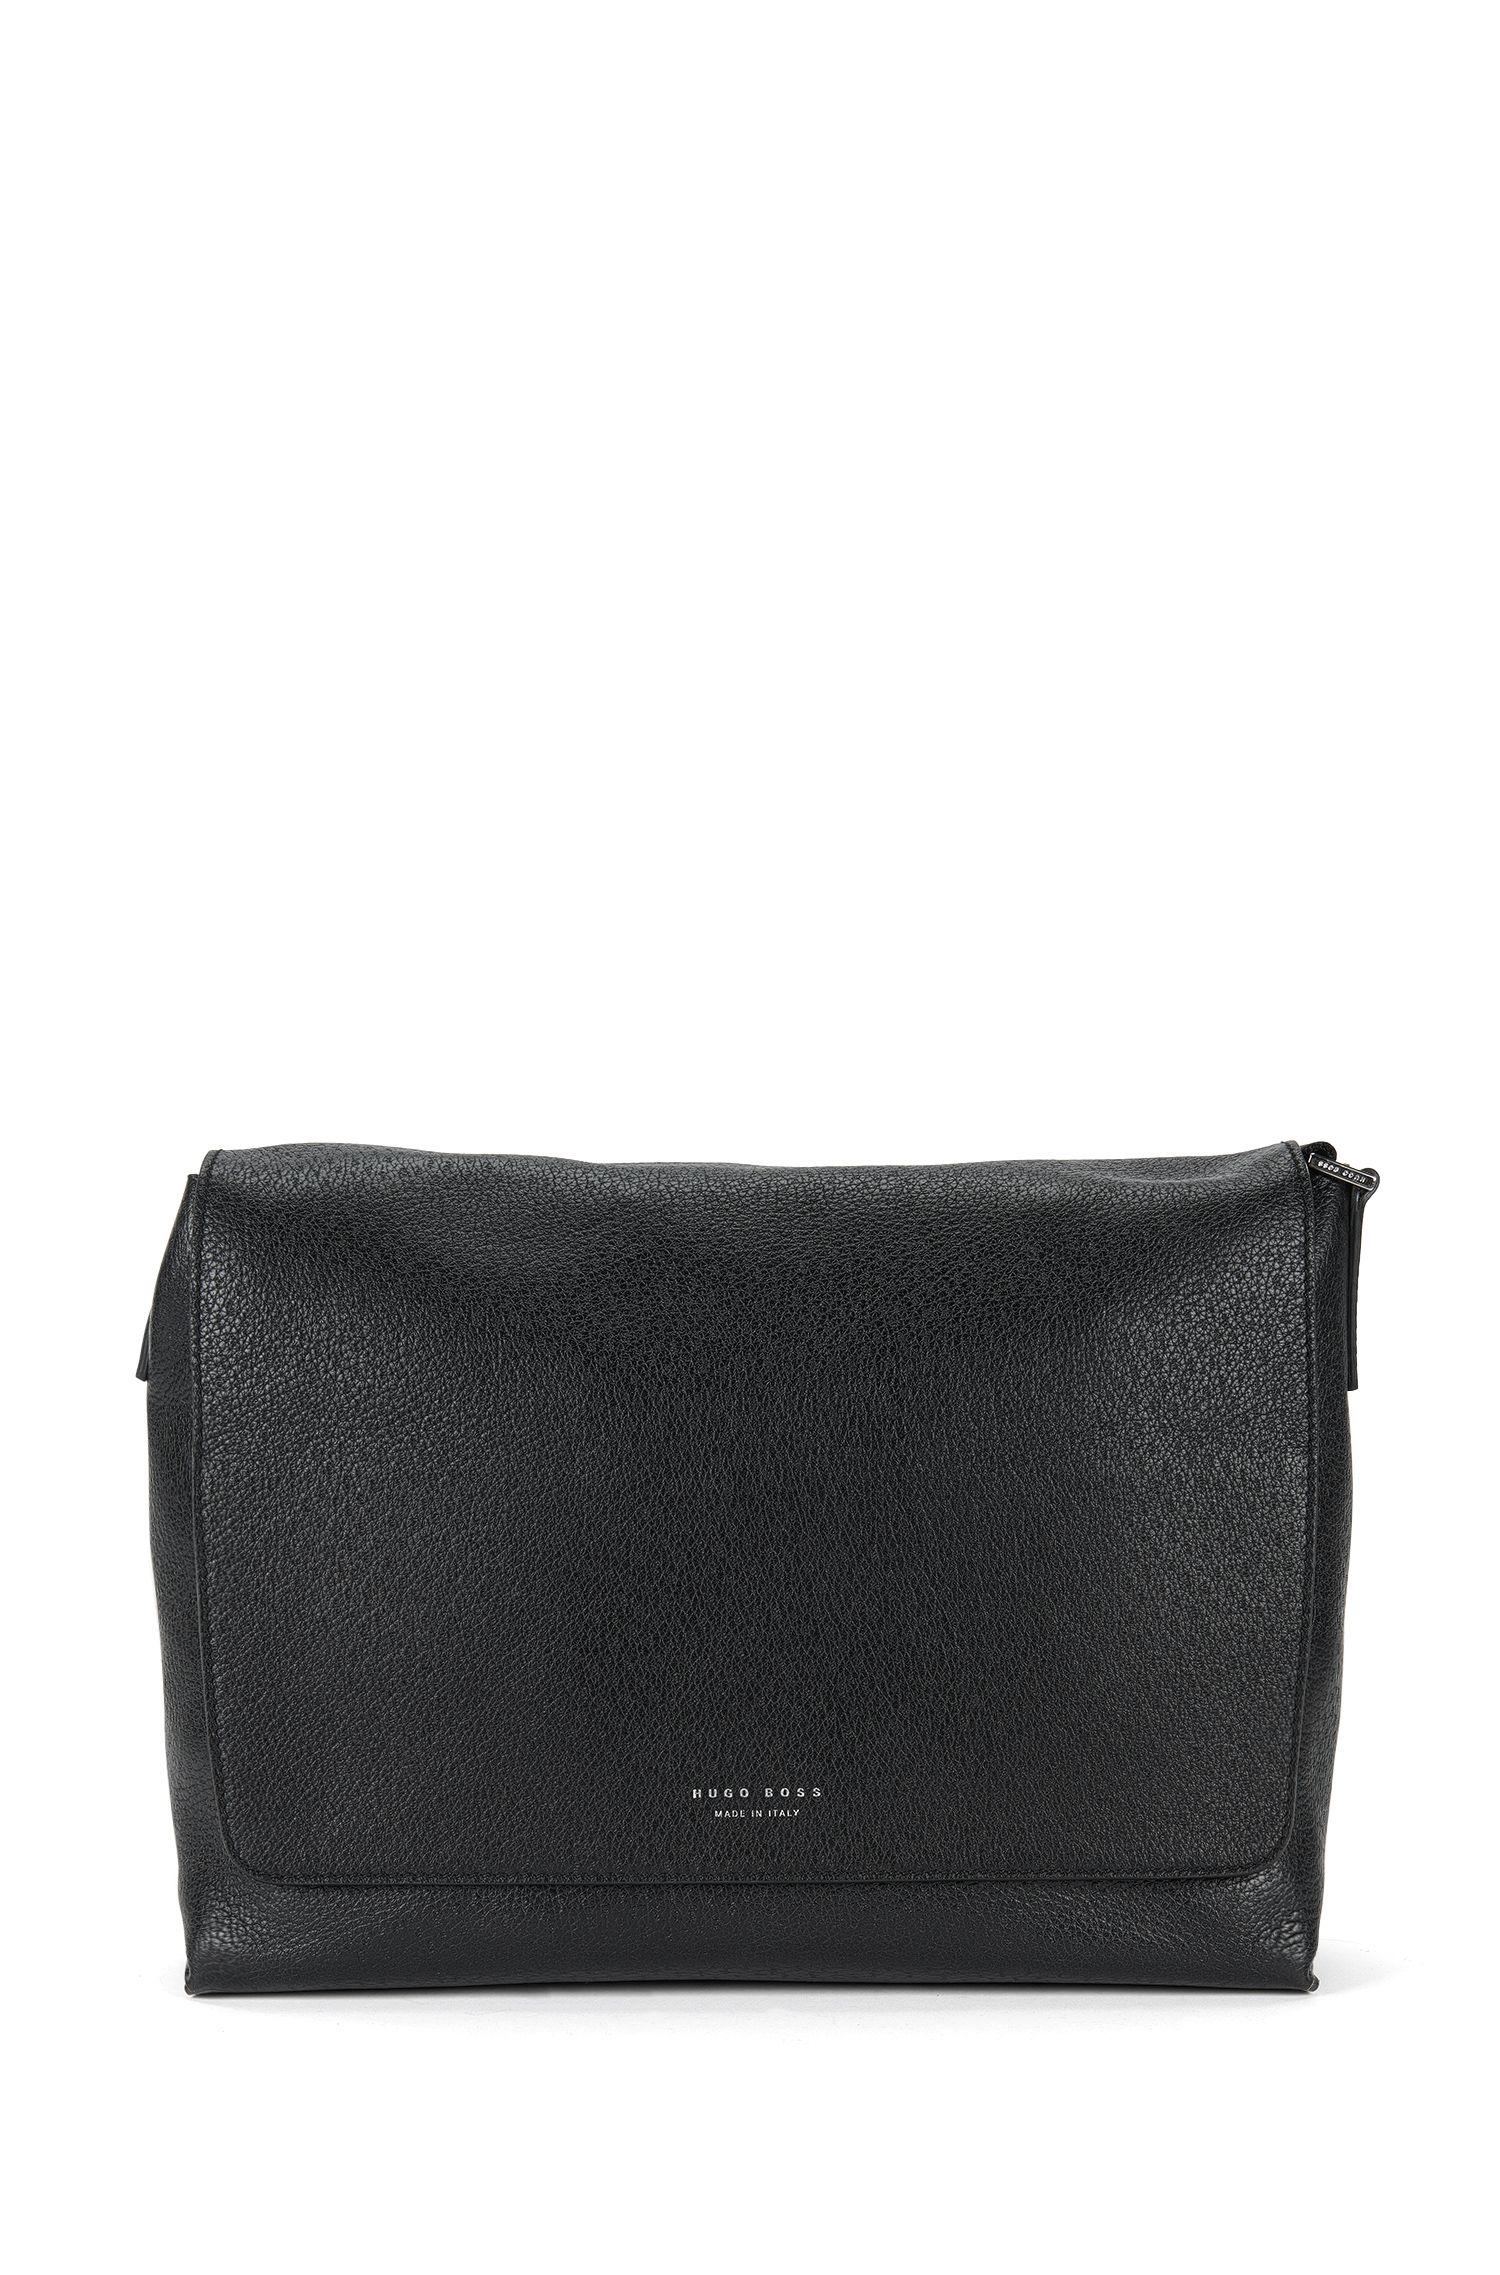 'S Pecary Mess Flap' | Leather Messenger Bag, Shoulder Strap